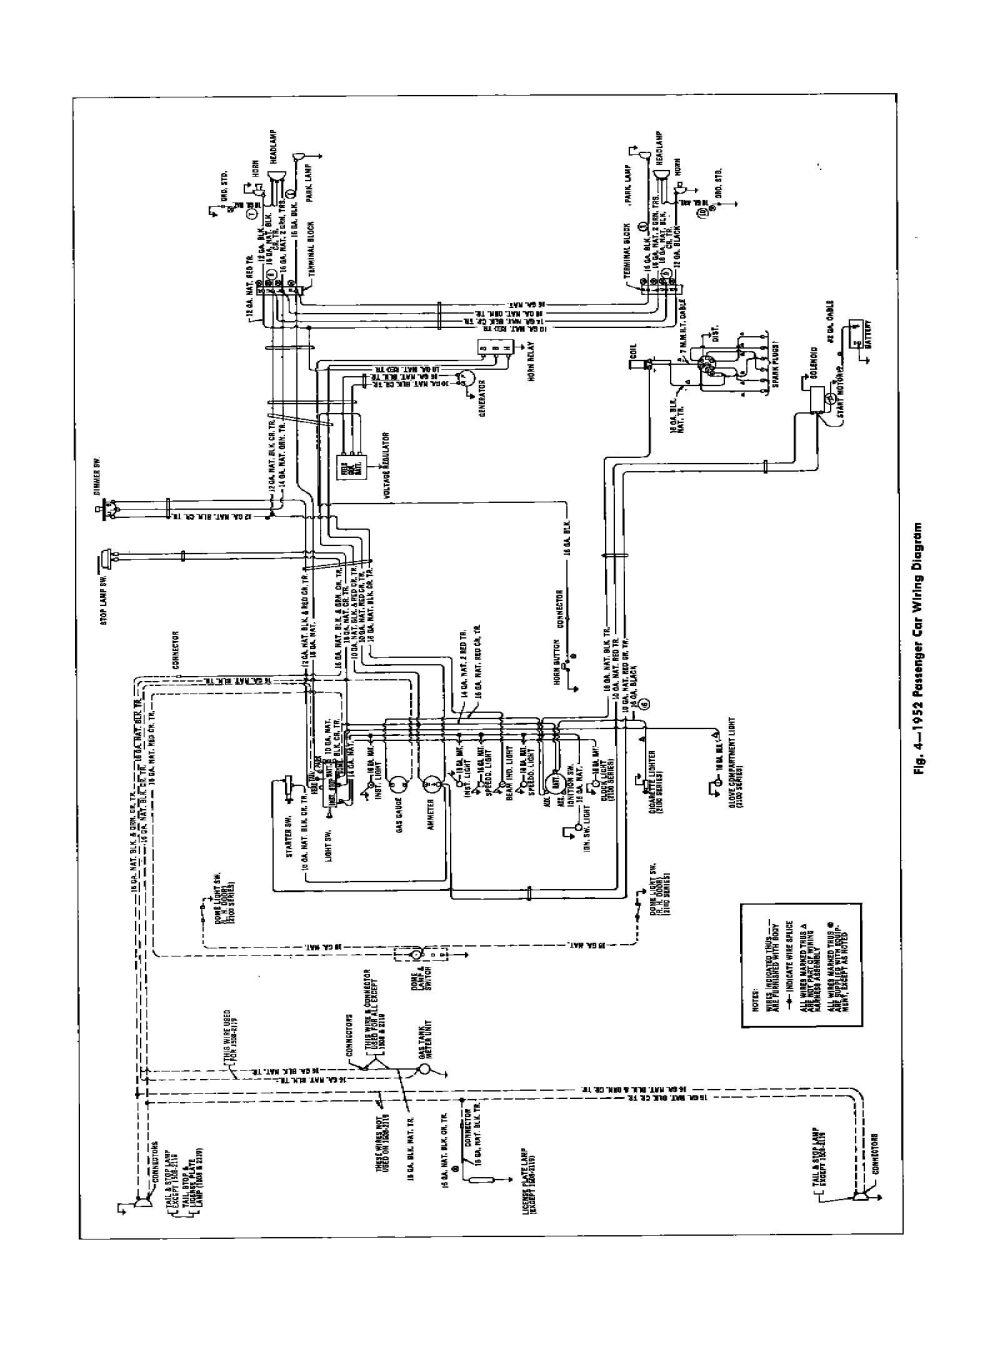 medium resolution of wiring diagram for a 1952 chevy truck wiring get free basic brake light wiring diagram basic brake light wiring diagram